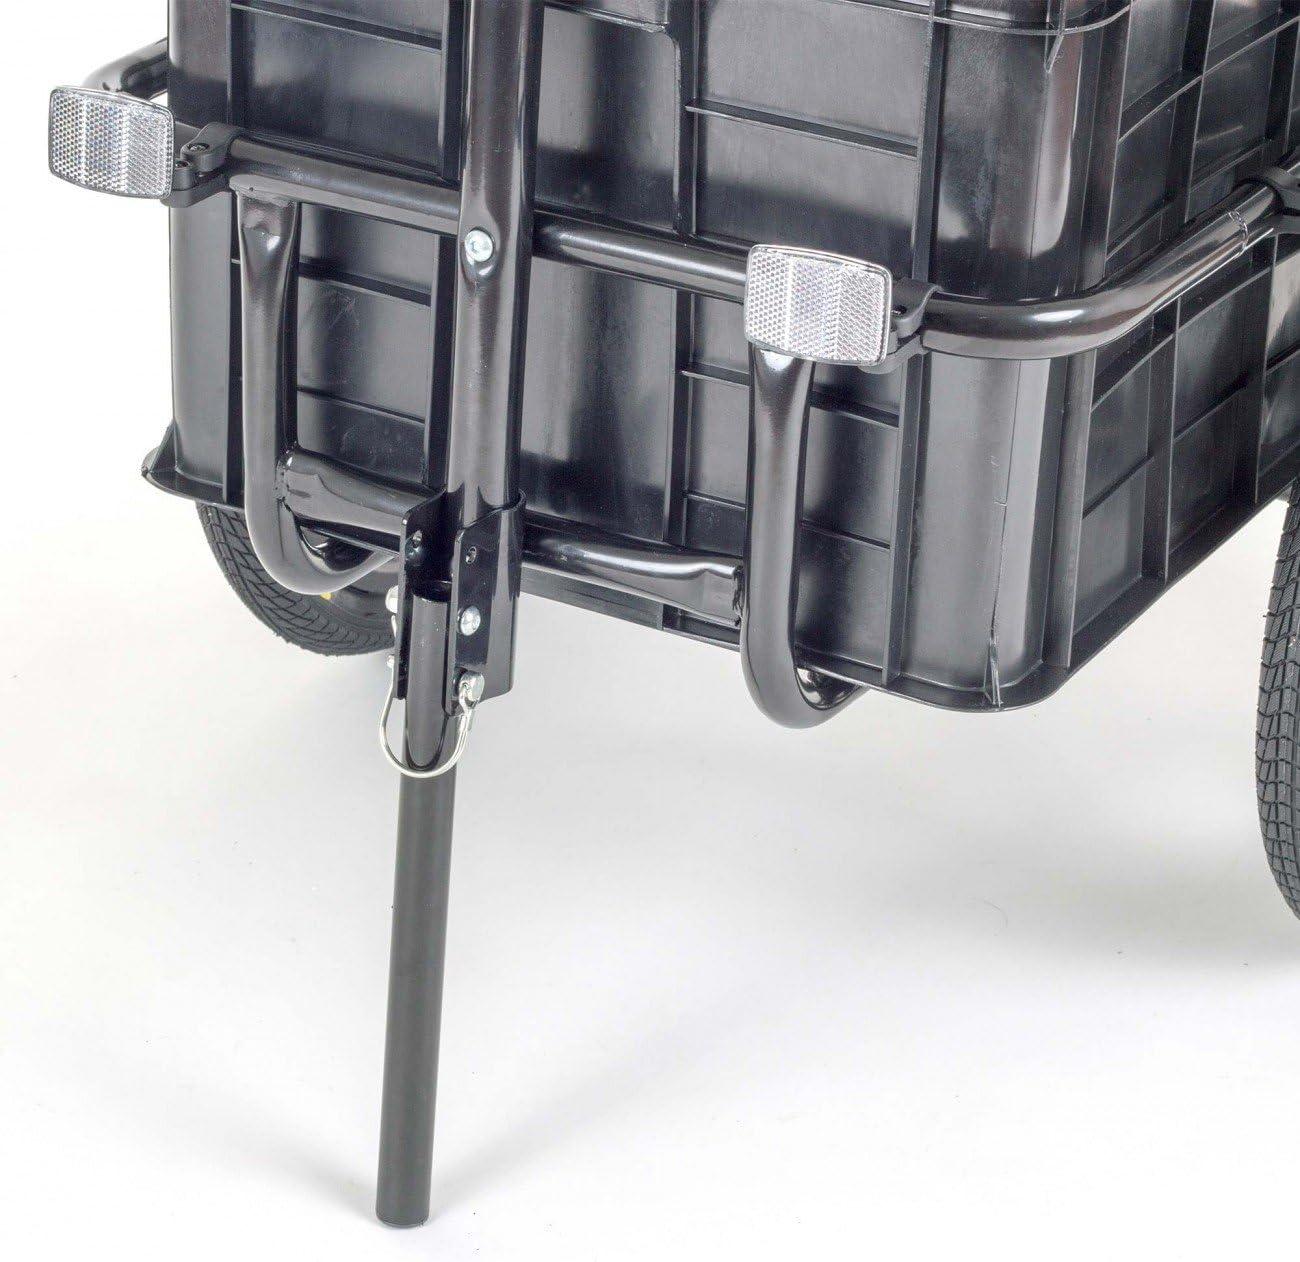 weitere Farben verf/ügbar 70 Liter in Gelb SAMAX Transportanh/änger Fahrradanh/änger Lastenanh/änger Fahrrad Anh/änger Handwagen mit Kunststoffwanne f/ür 60 Kg